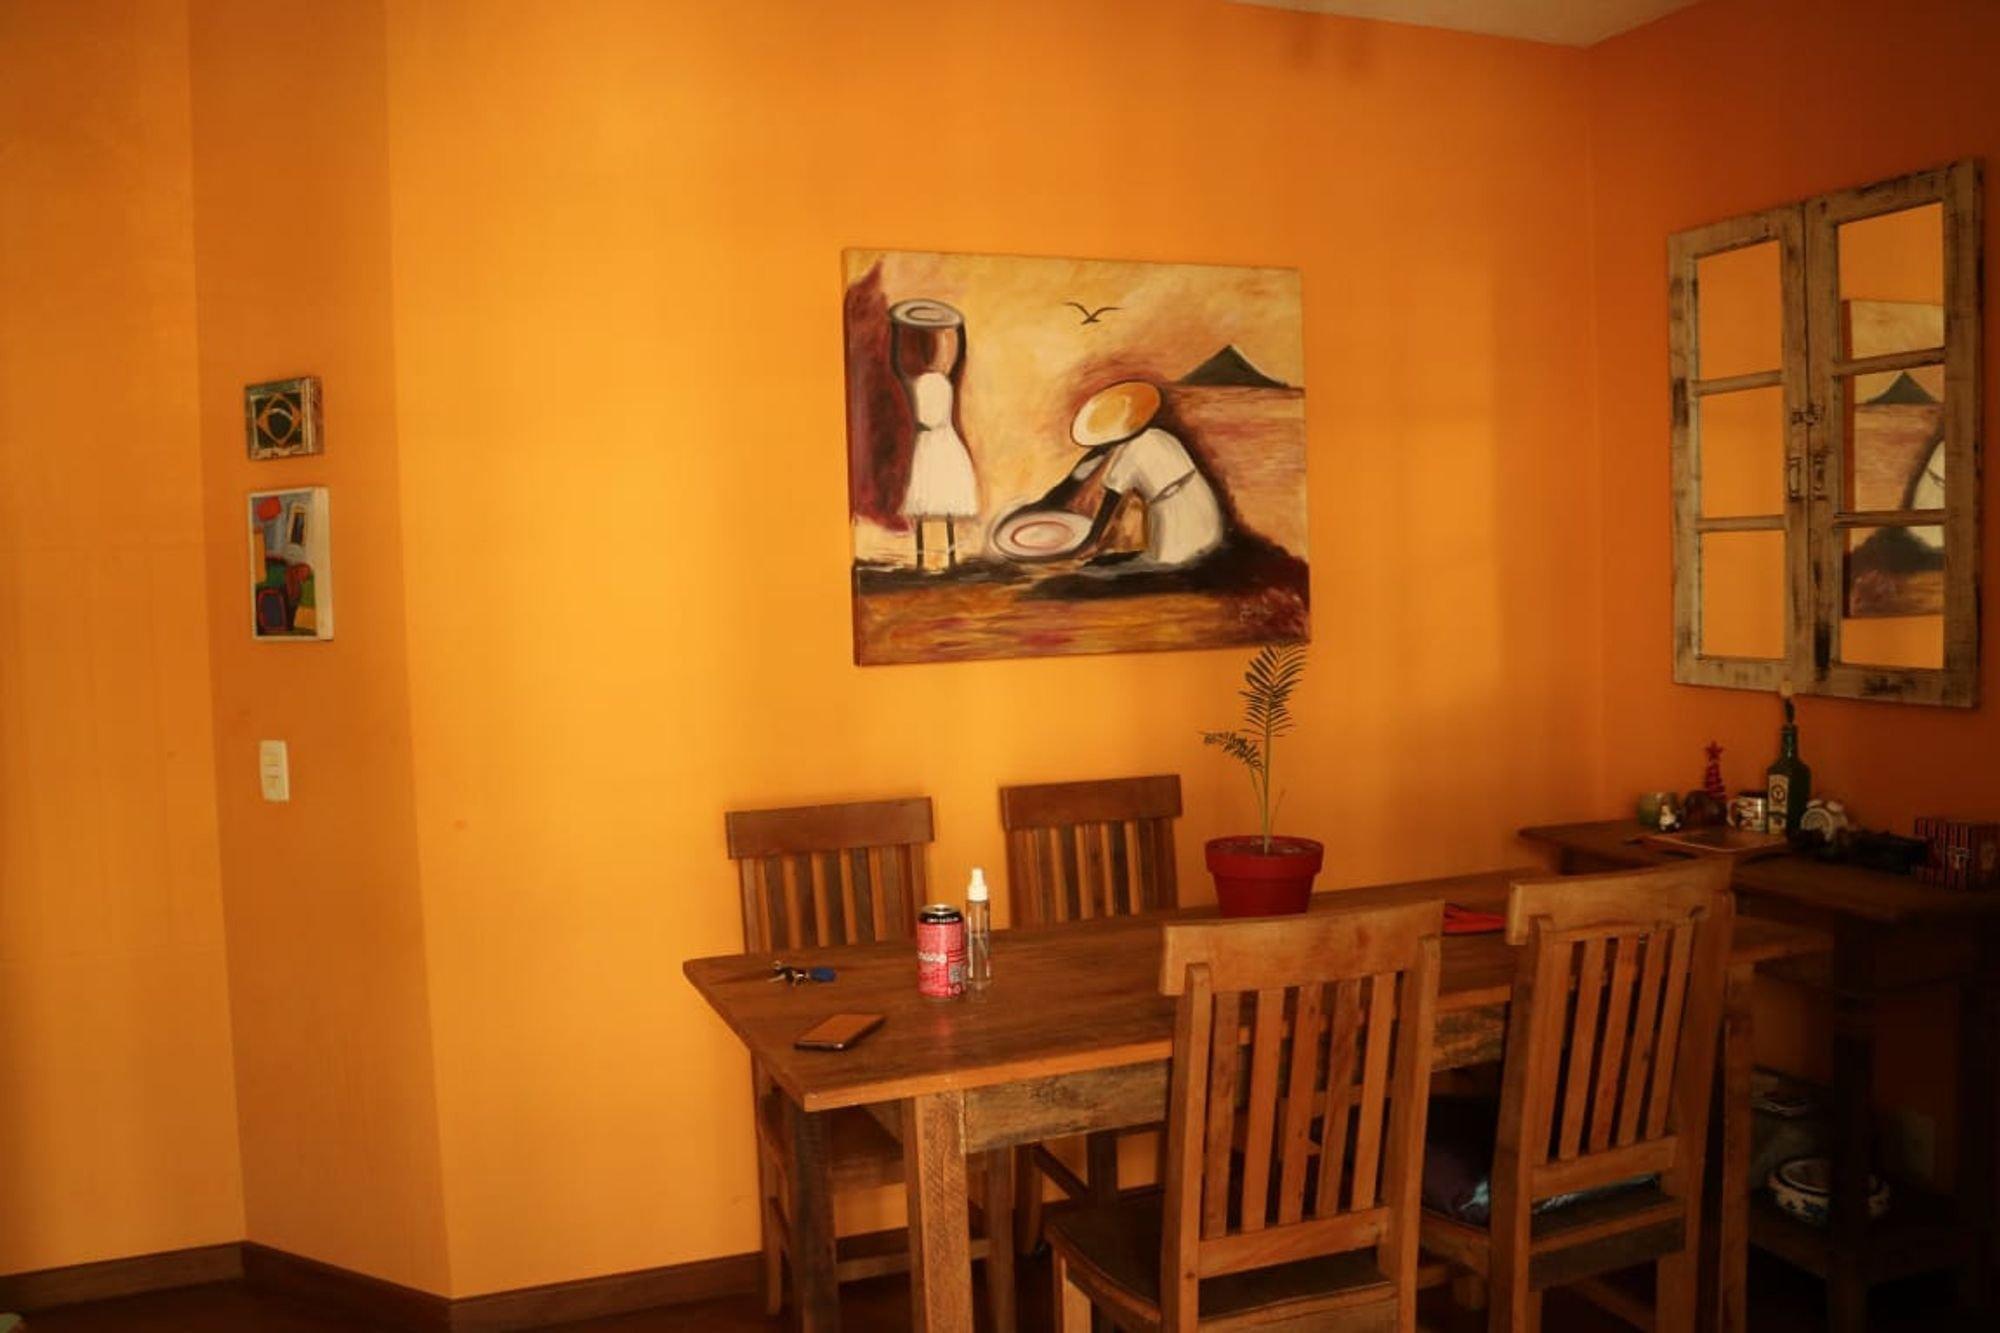 Foto de Hall com vaso de planta, garrafa, cadeira, mesa de jantar, xícara